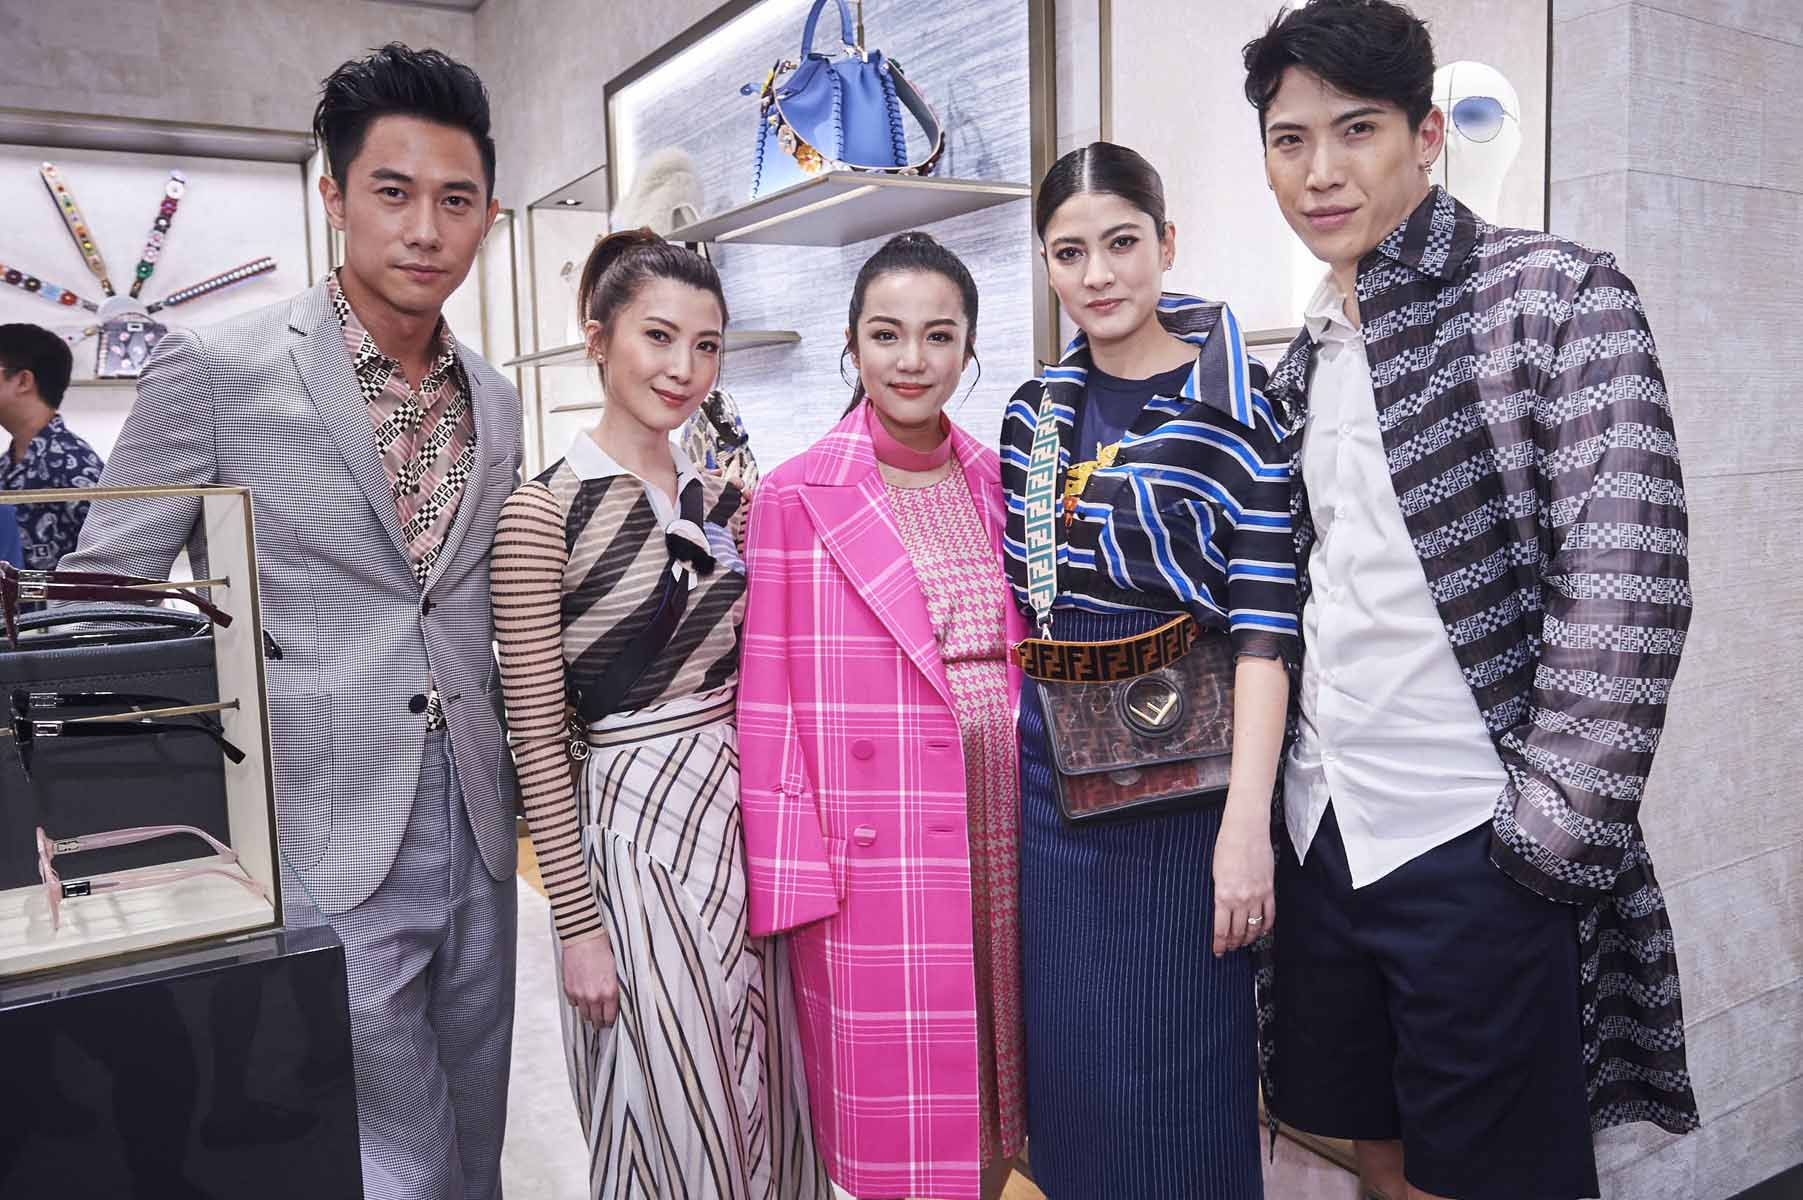 Desmond Tan, Jeanette Aw, Yoyo Cao, Rasri Balenciaga, Patsarakorn Chirathivat